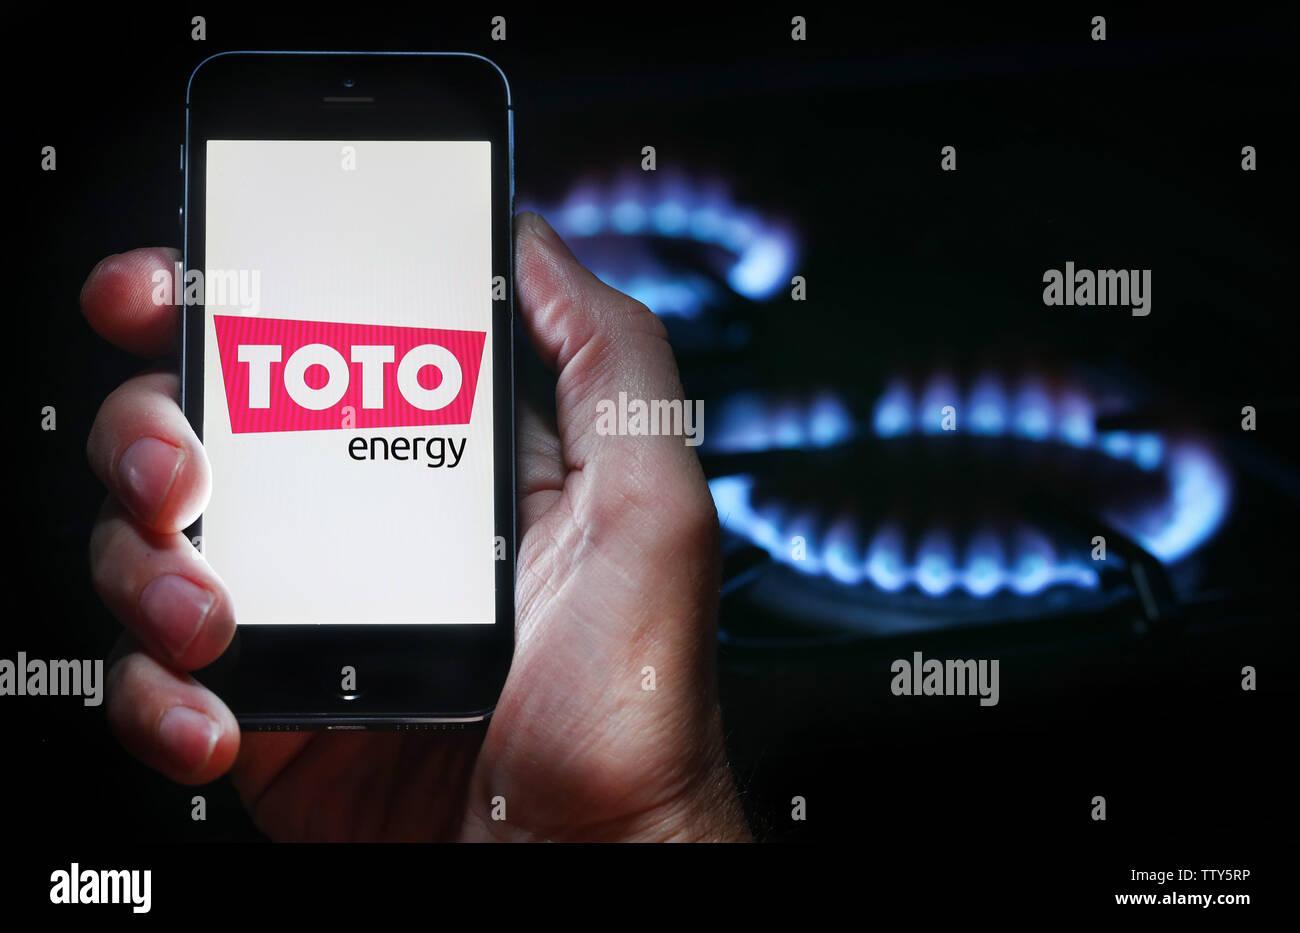 Toto Company